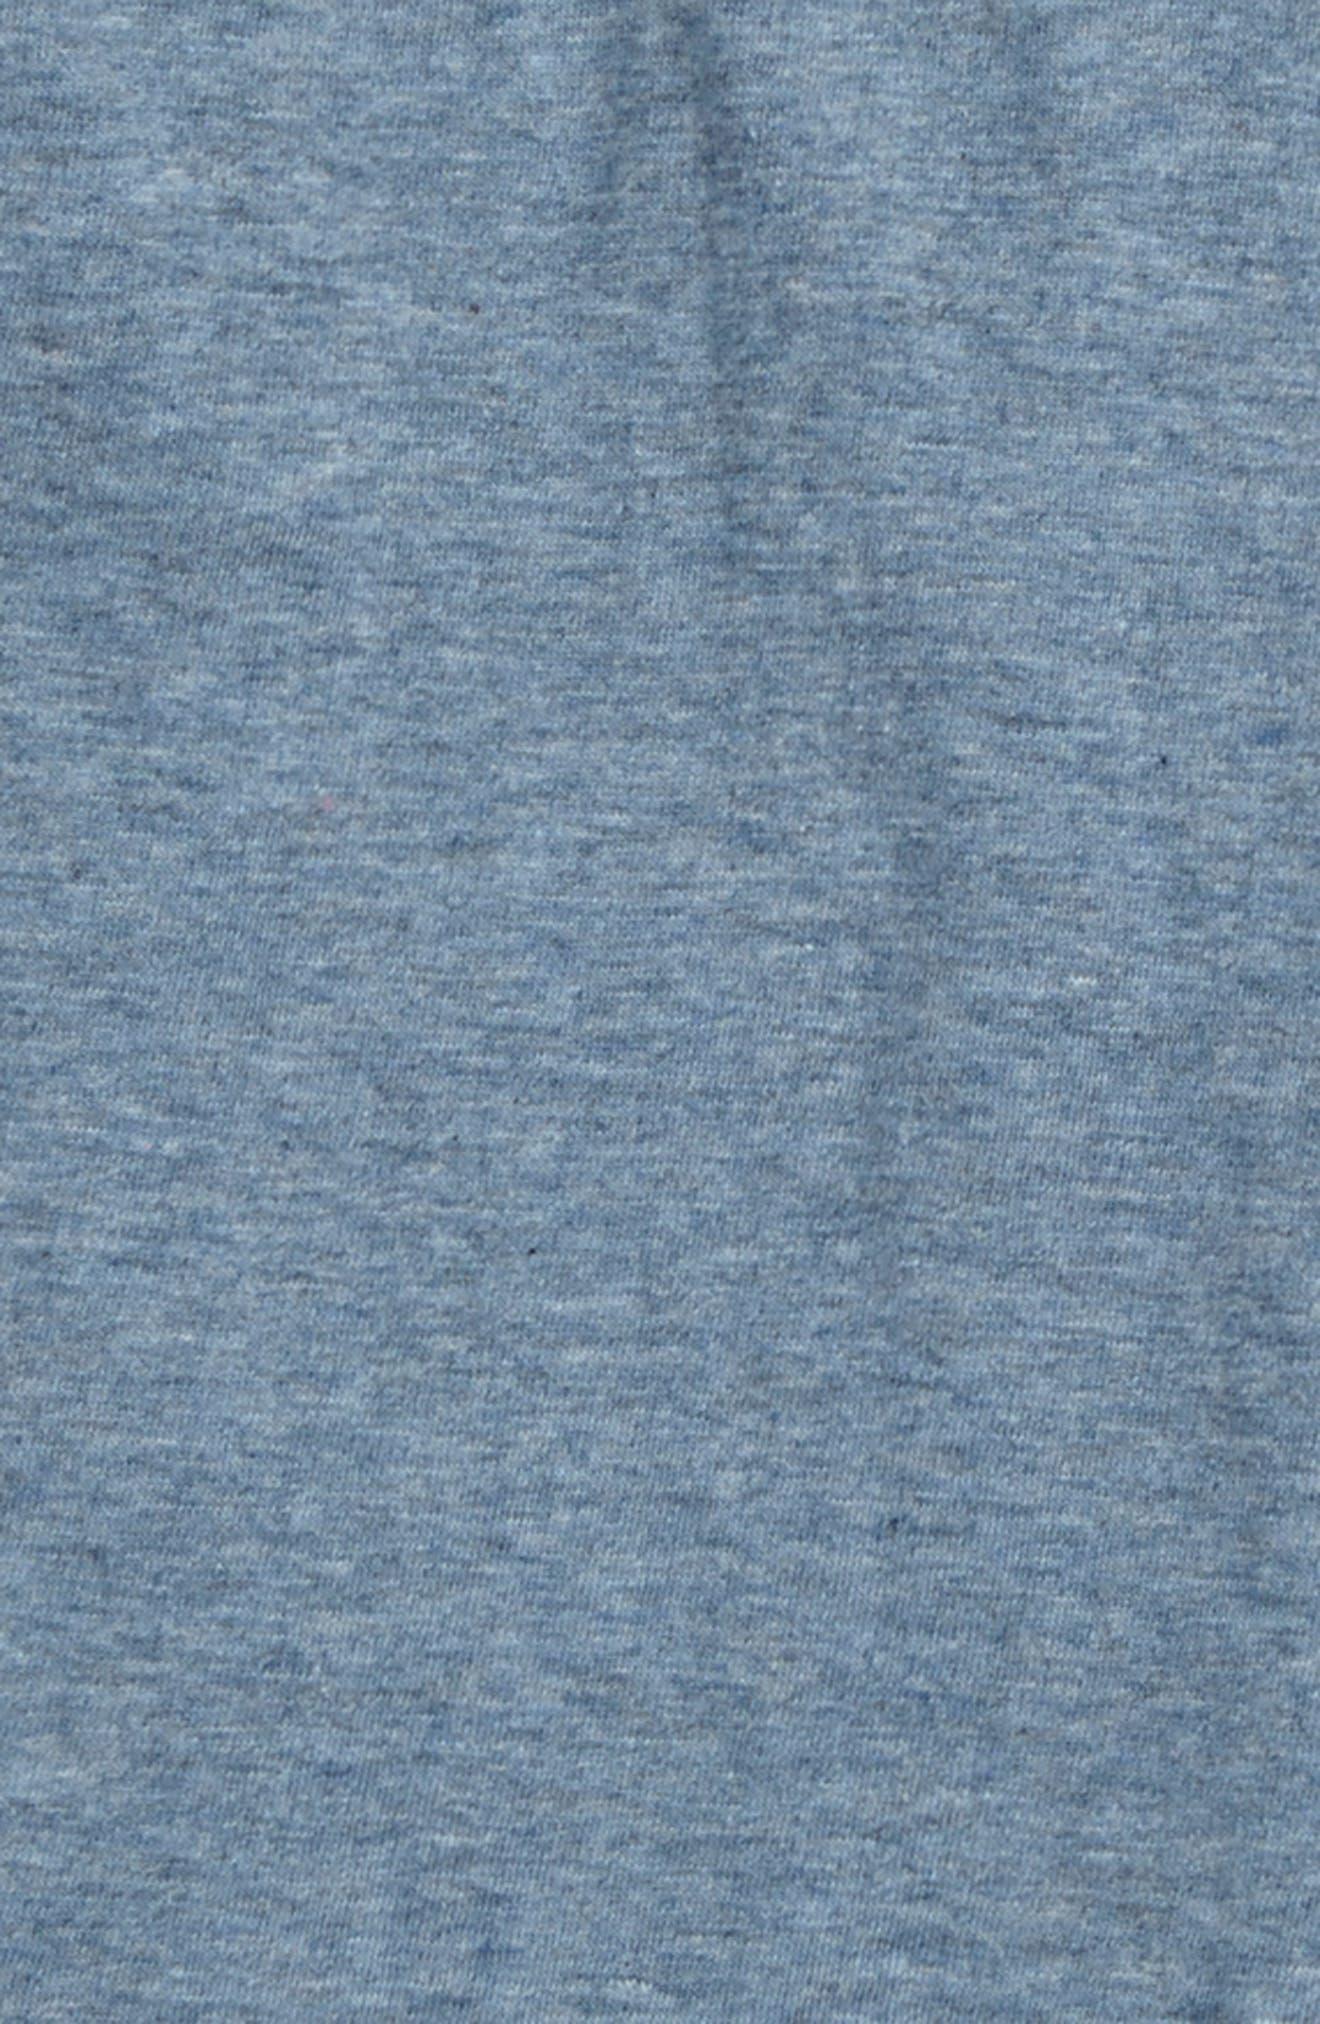 Alternate Image 2  - Burt's Bees Baby Organic Cotton Henley T-Shirt (Toddler Boys & Little Boys)